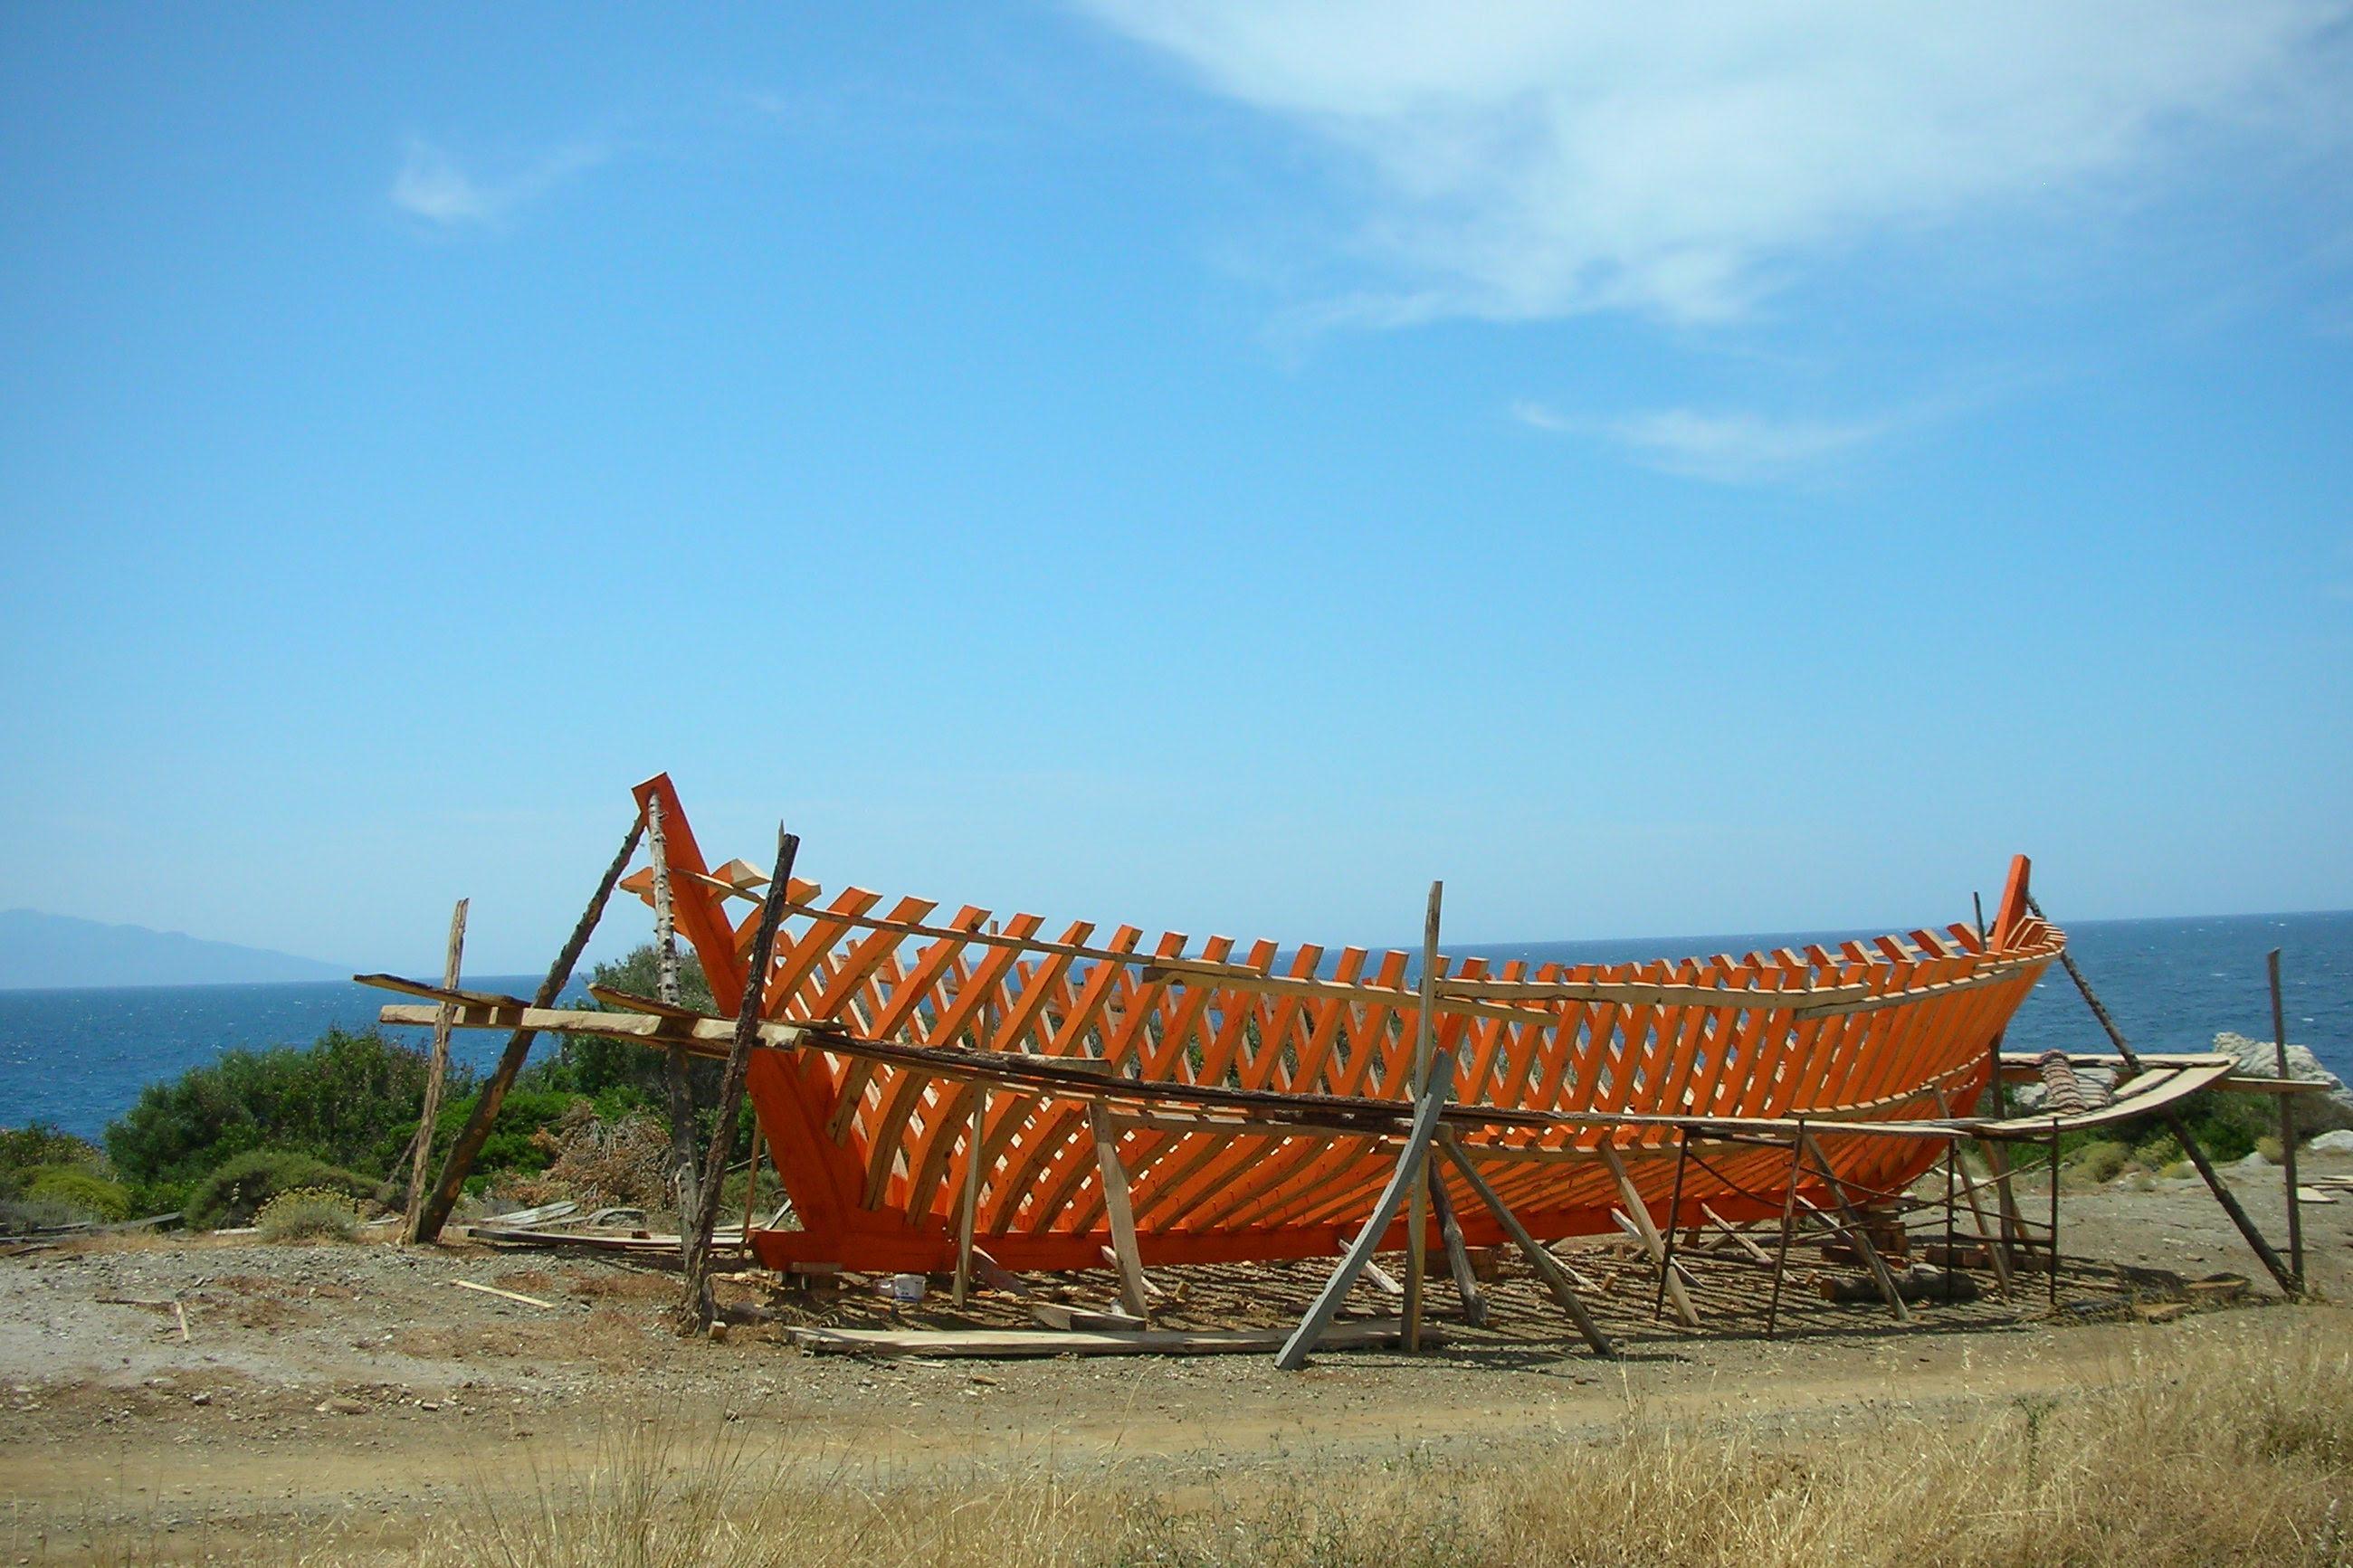 File:Samos Agios Isidoros 002.jpg - Wikimedia Commons